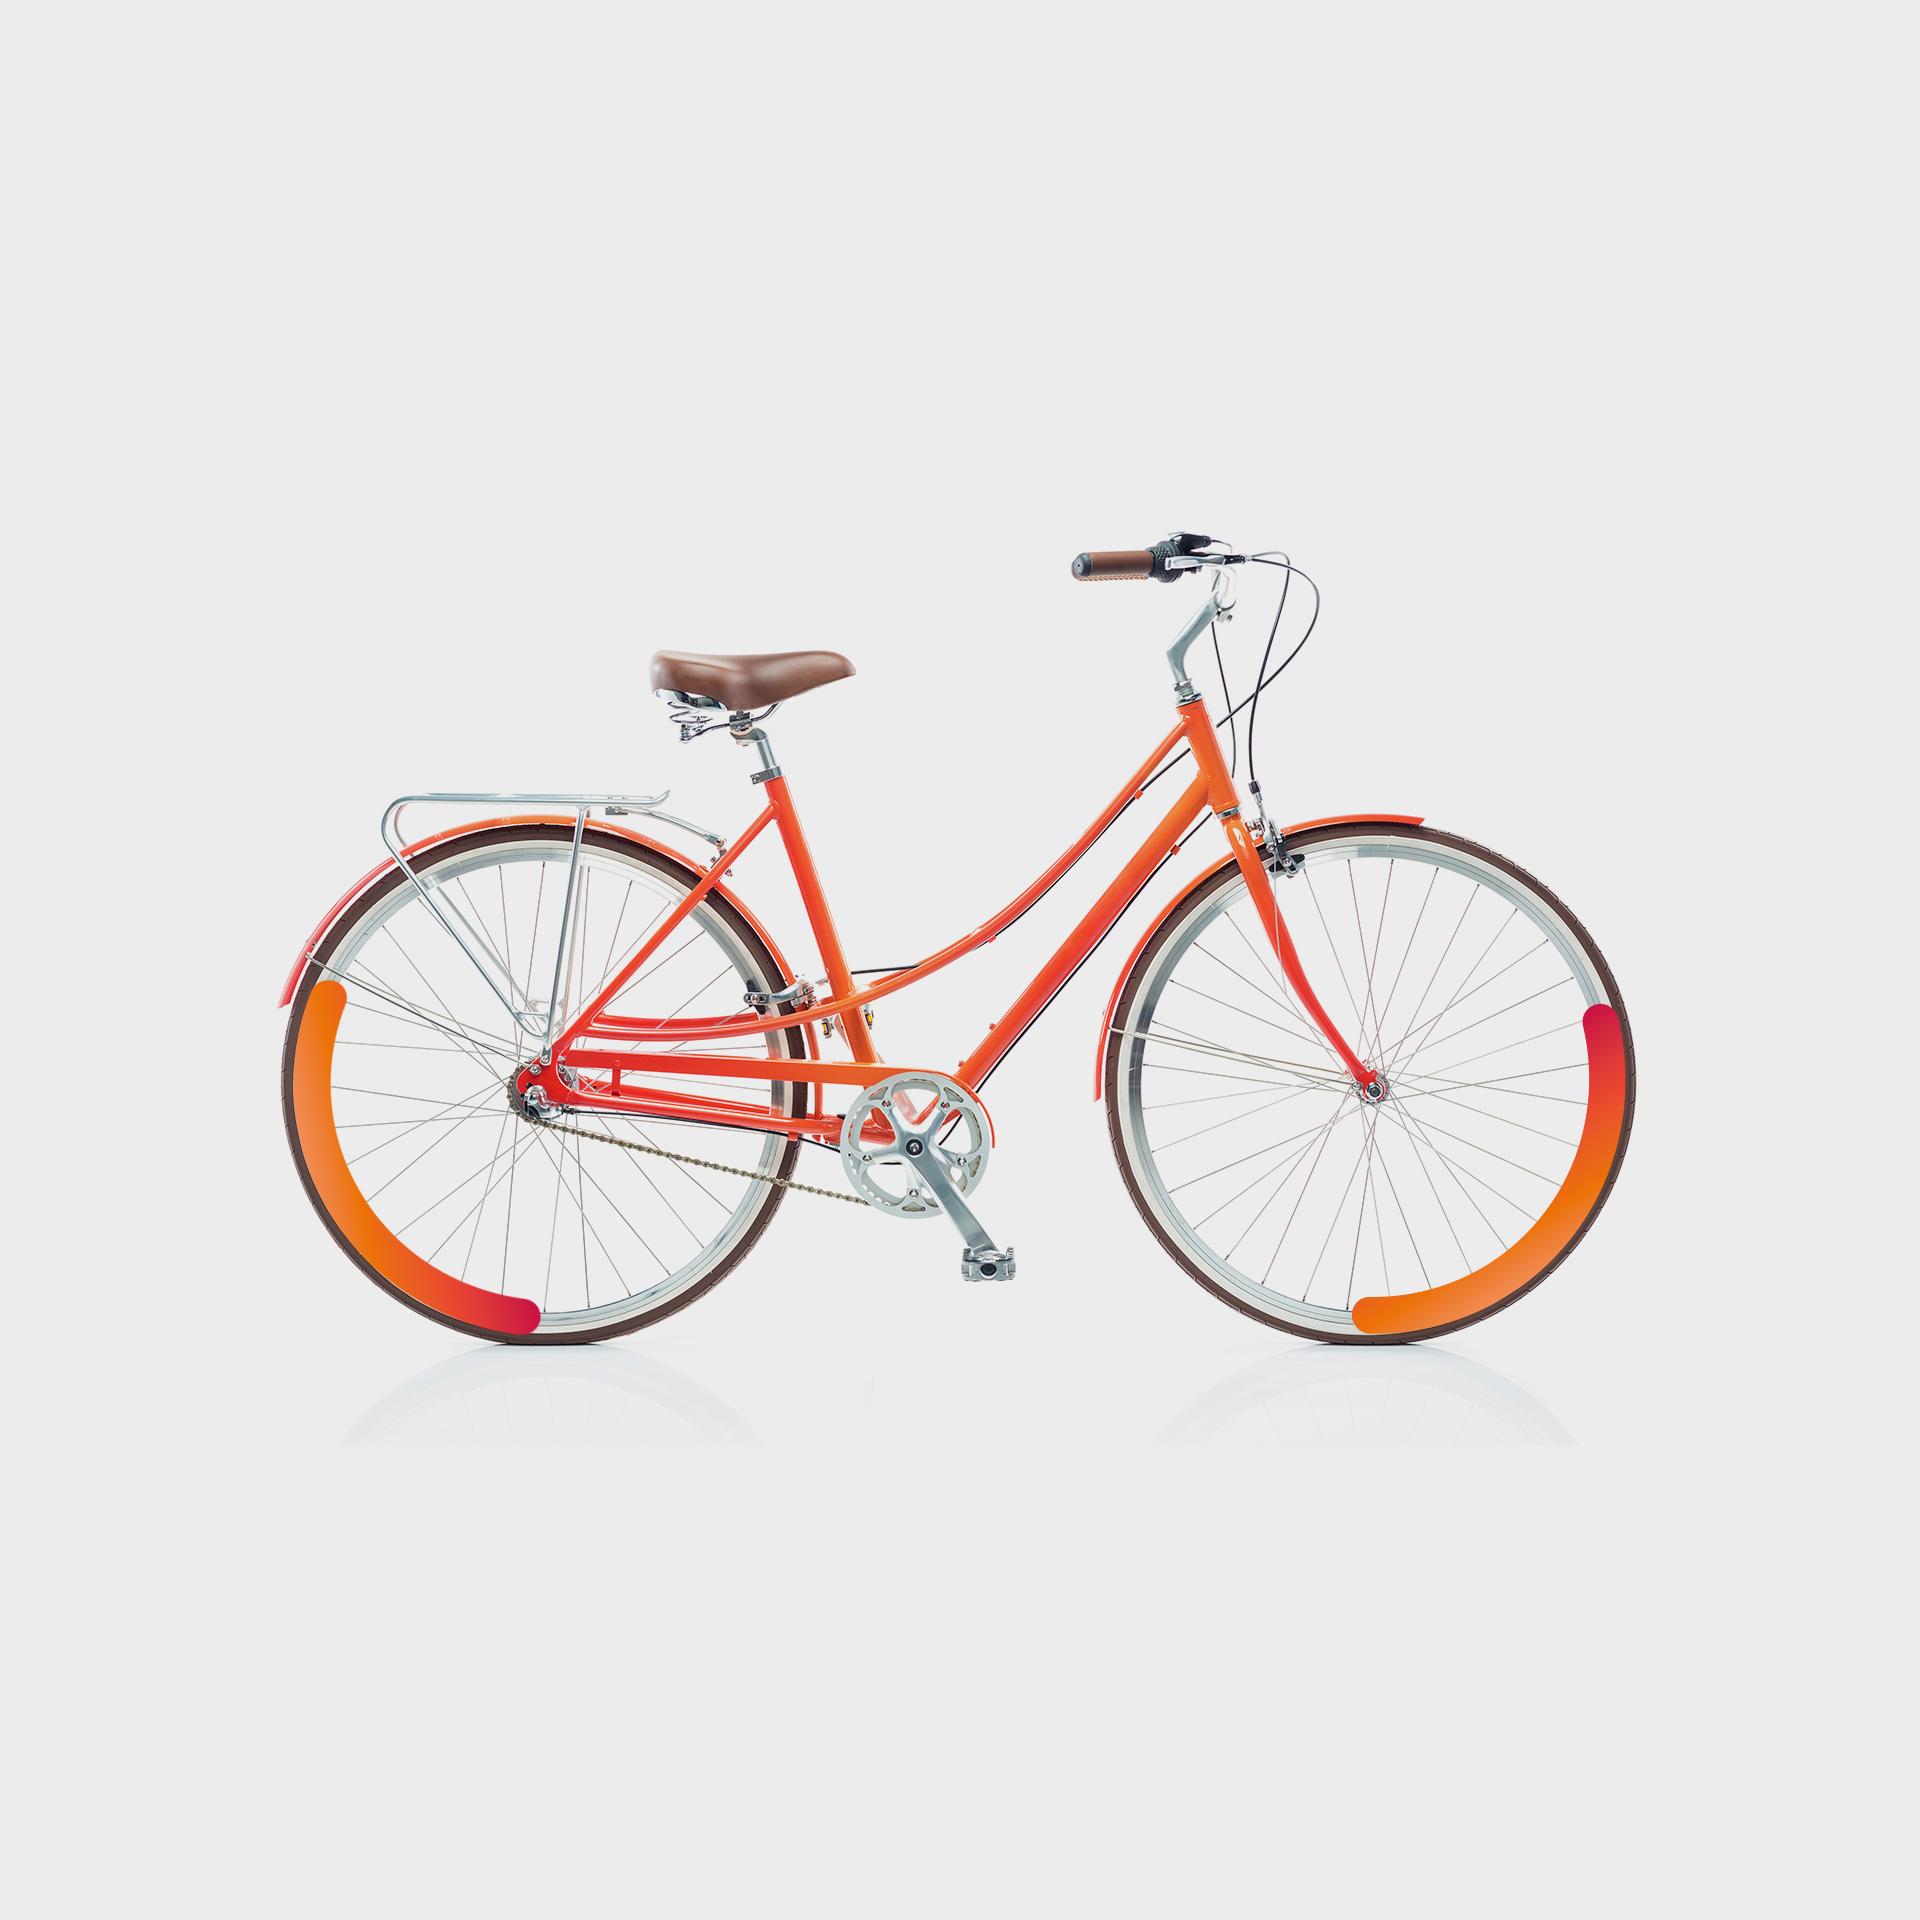 sv_fiets2.jpg